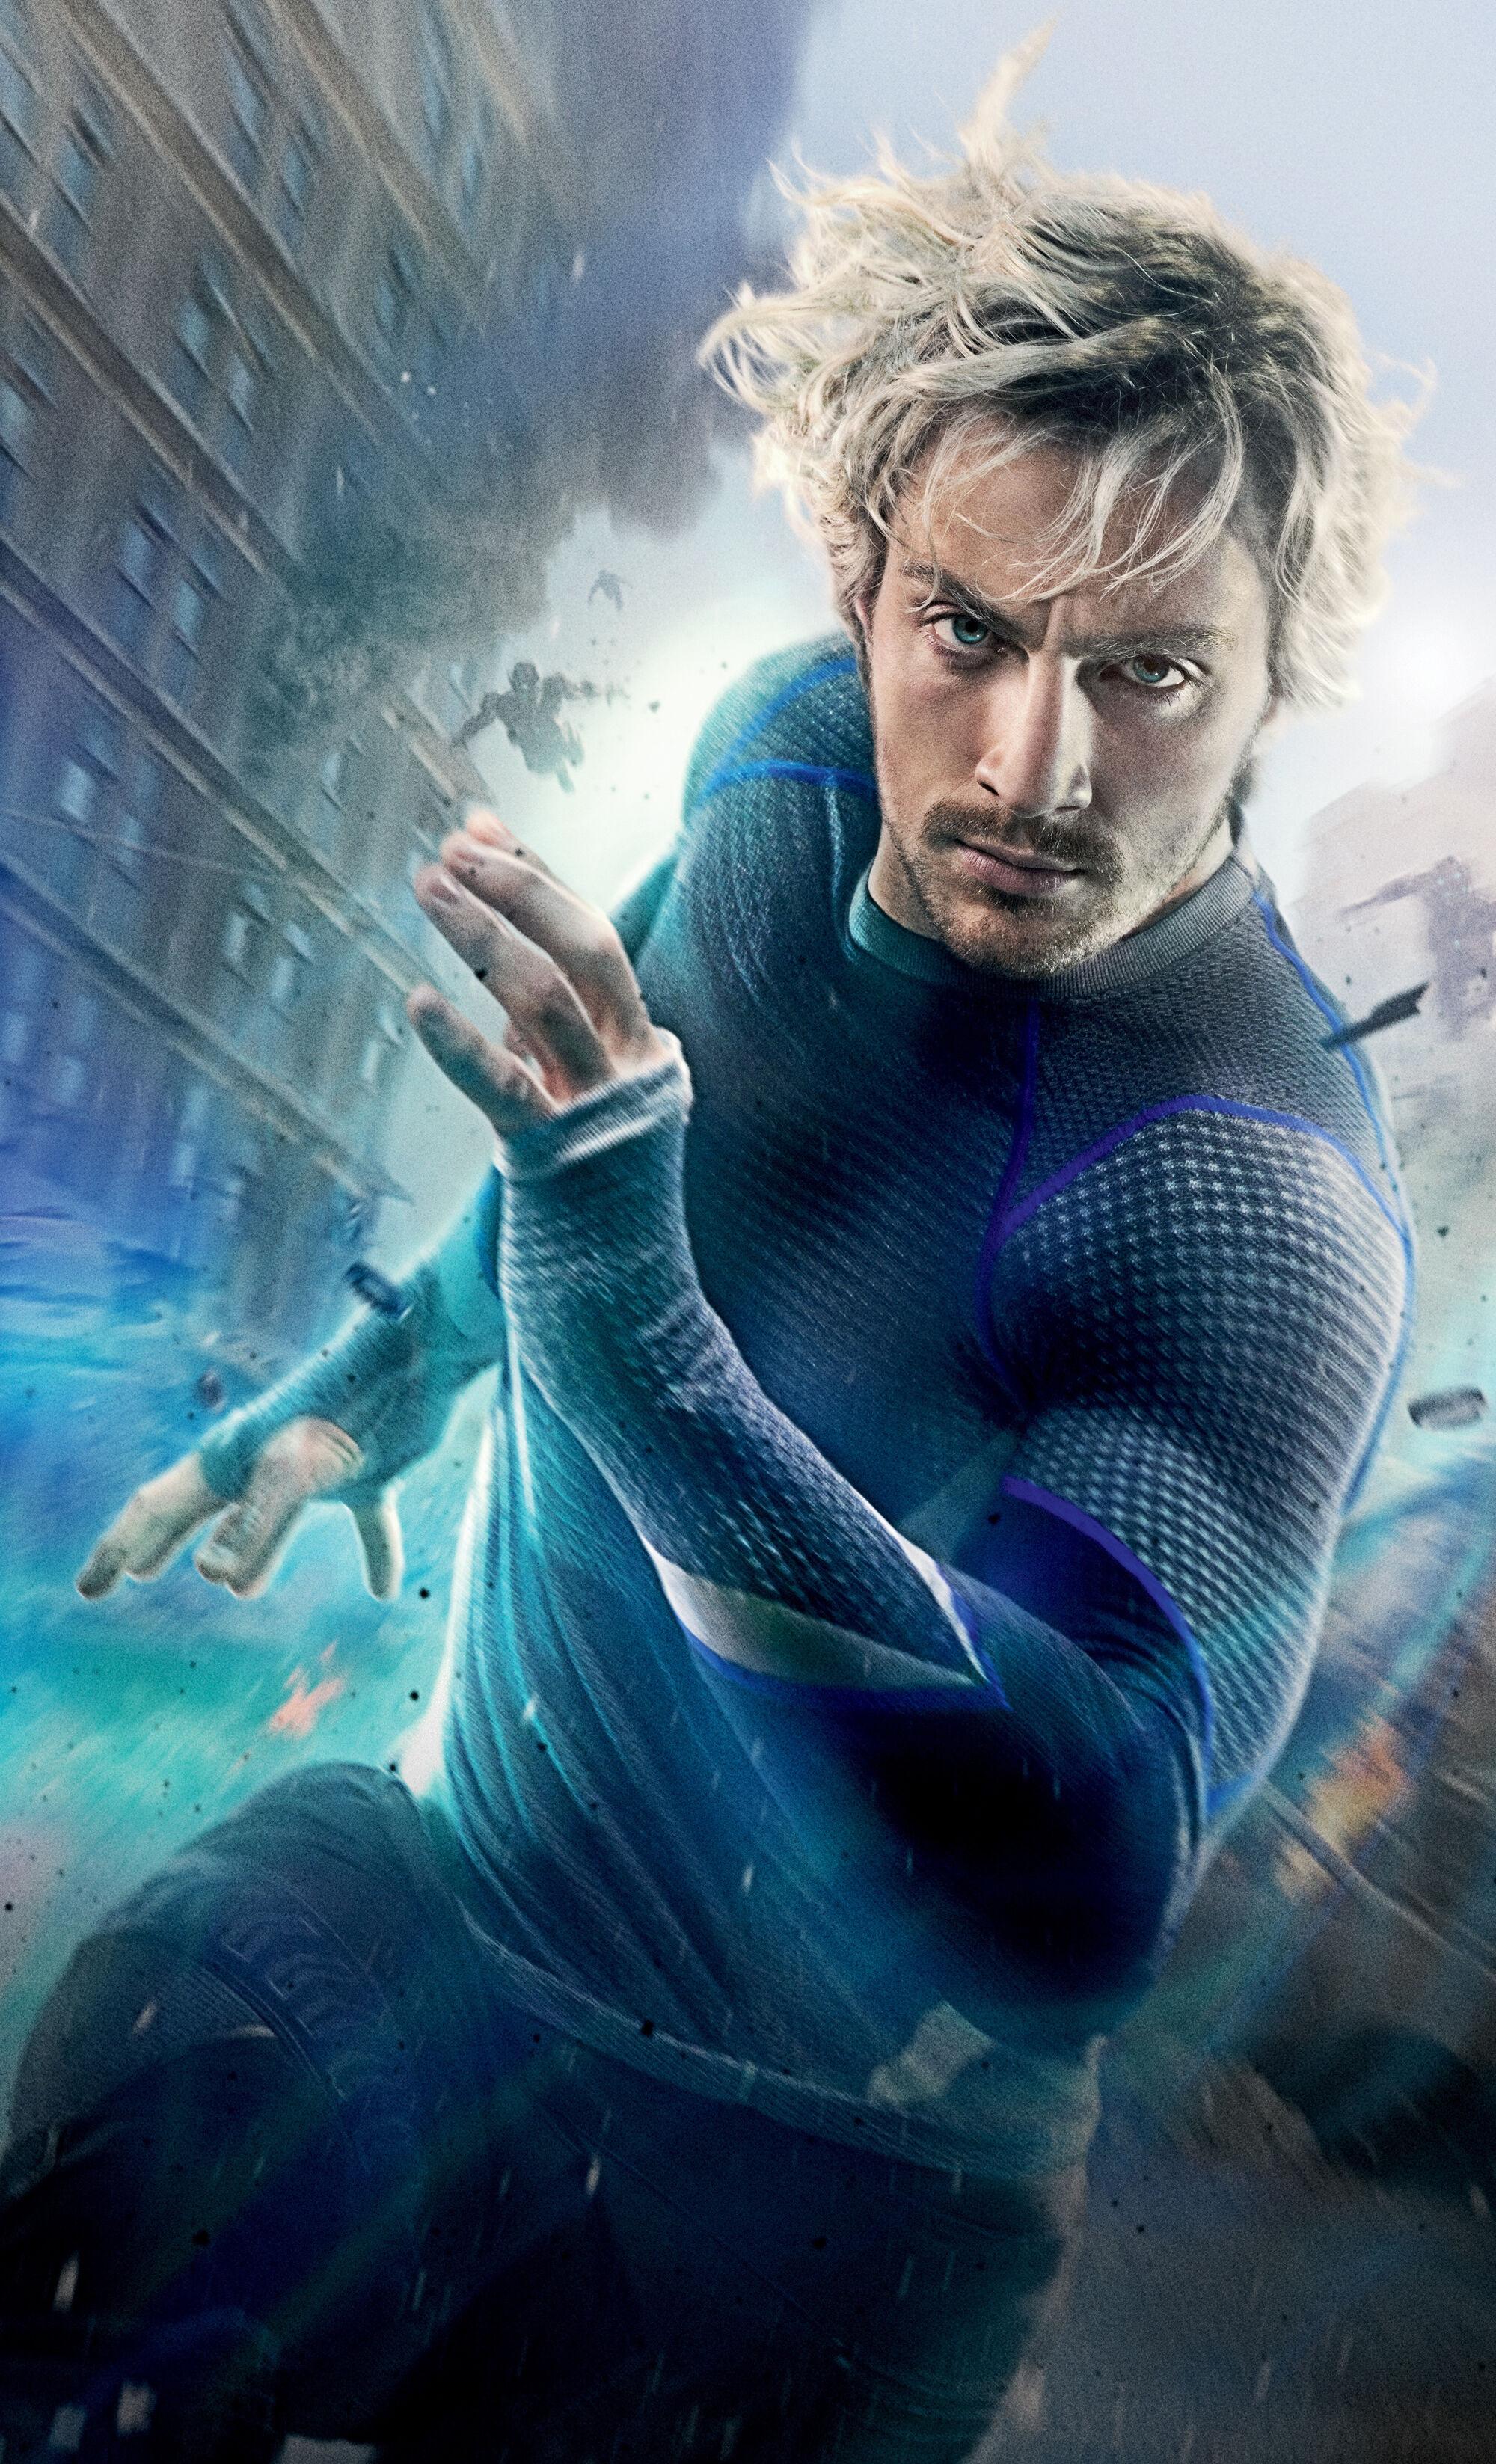 Marvel quicksilver movie photos